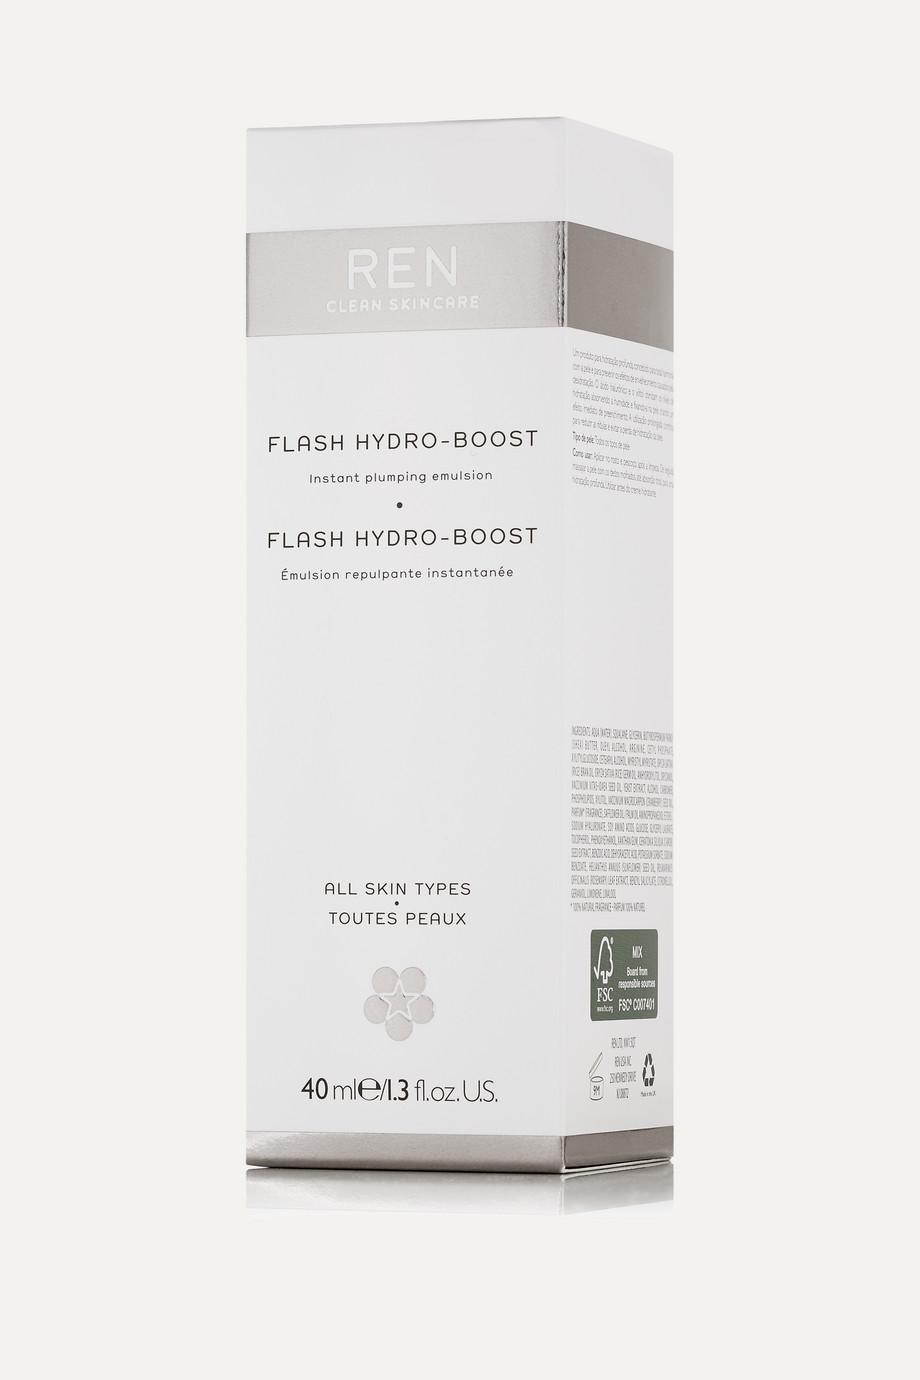 REN Clean Skincare 瞬效丰润保湿乳,40ml